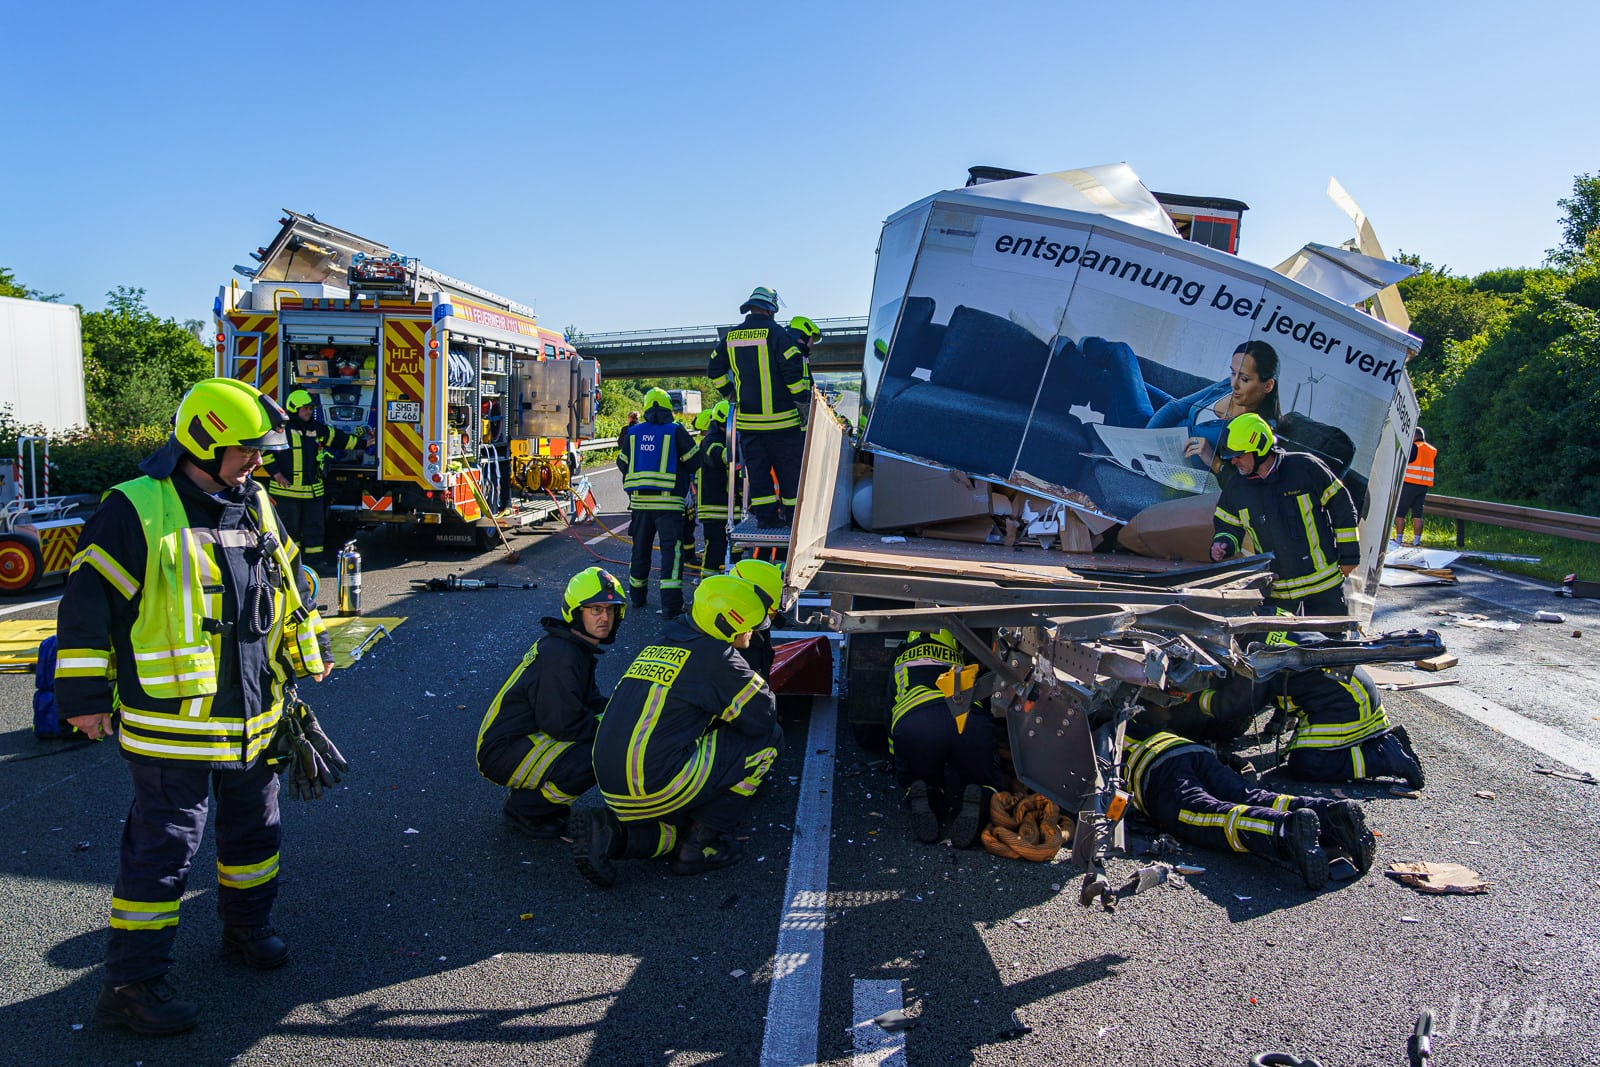 Die Helfer erwartete ein großes Trümmerfeld mit zerstörten Fahrzeugen. (Foto: n112.de/Stefan Simonsen)